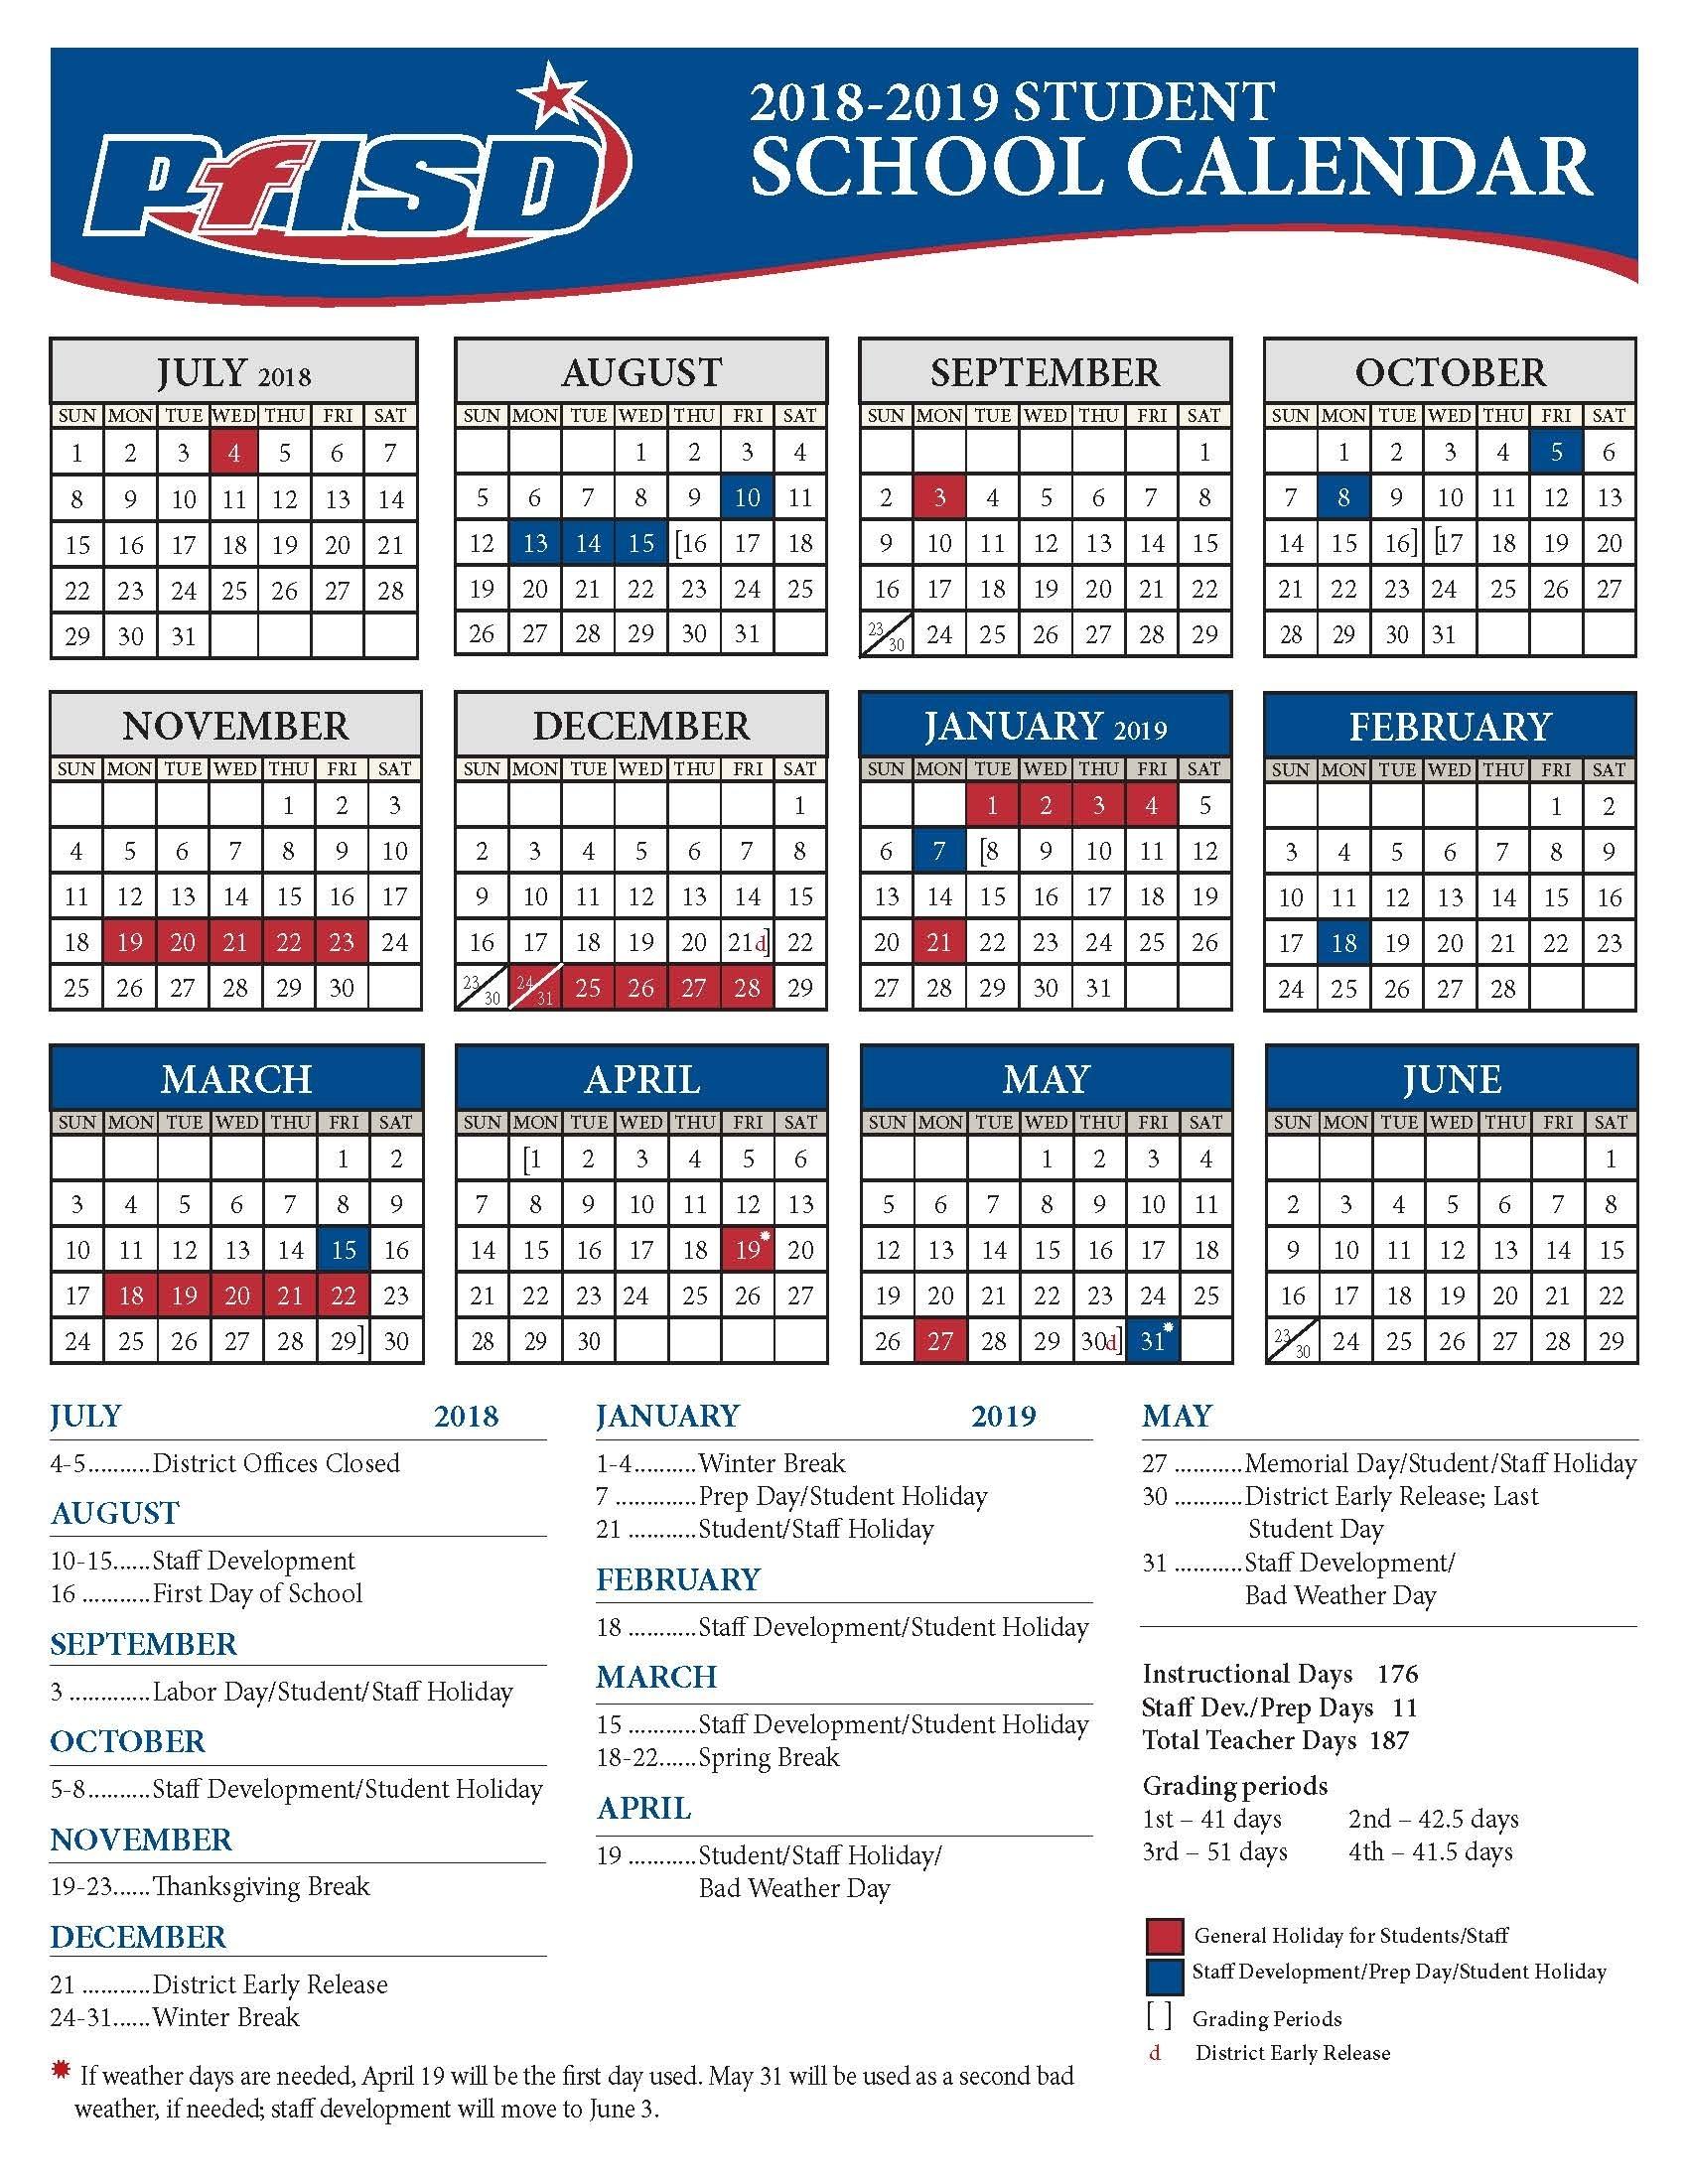 School Year Calendar / 2018-2019 District Calendar within 2019 And 2020 Google Calendars